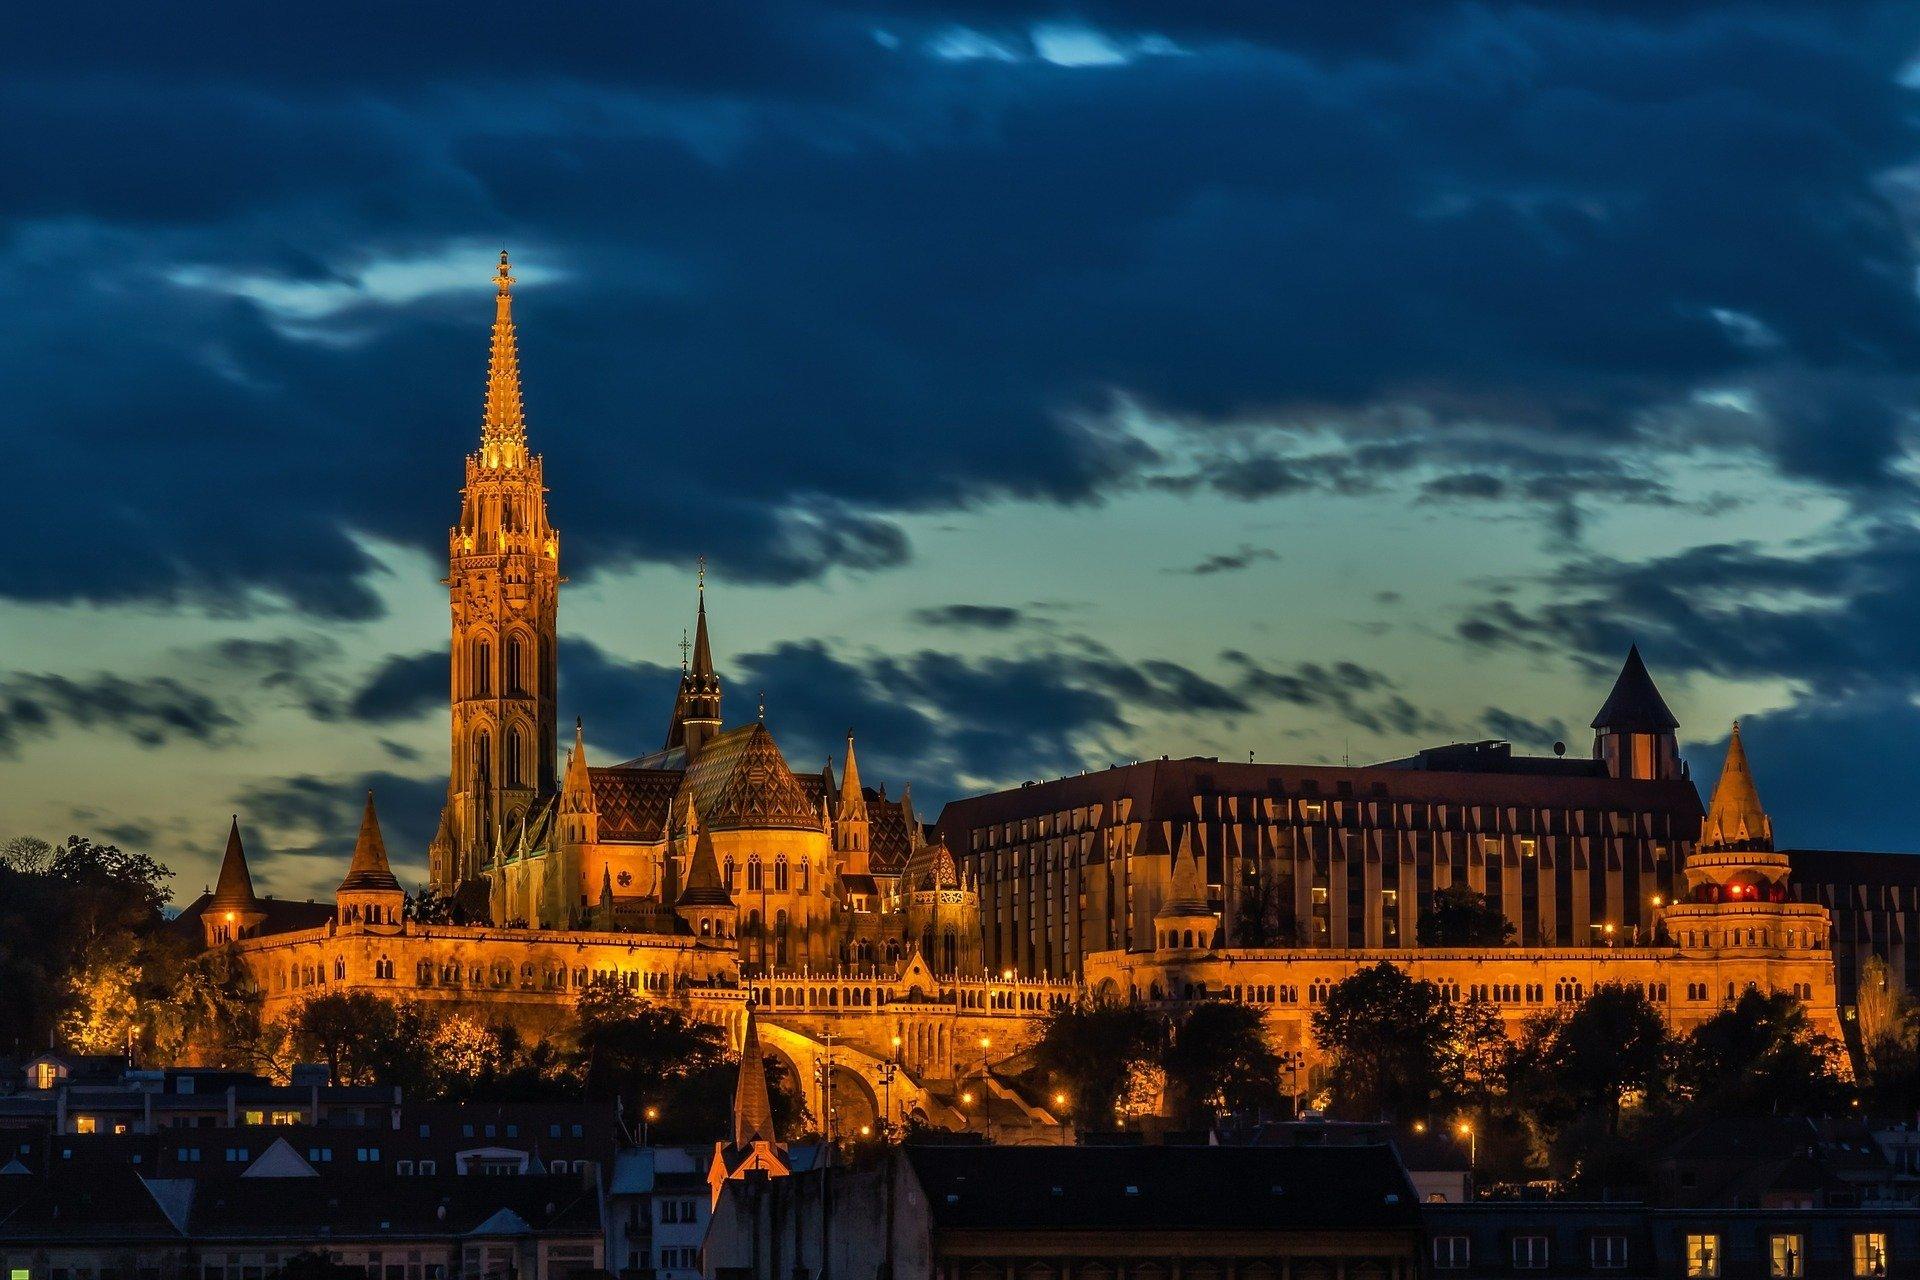 Вето на бюджет ЕС: Венгрия подготовилась к последствиям